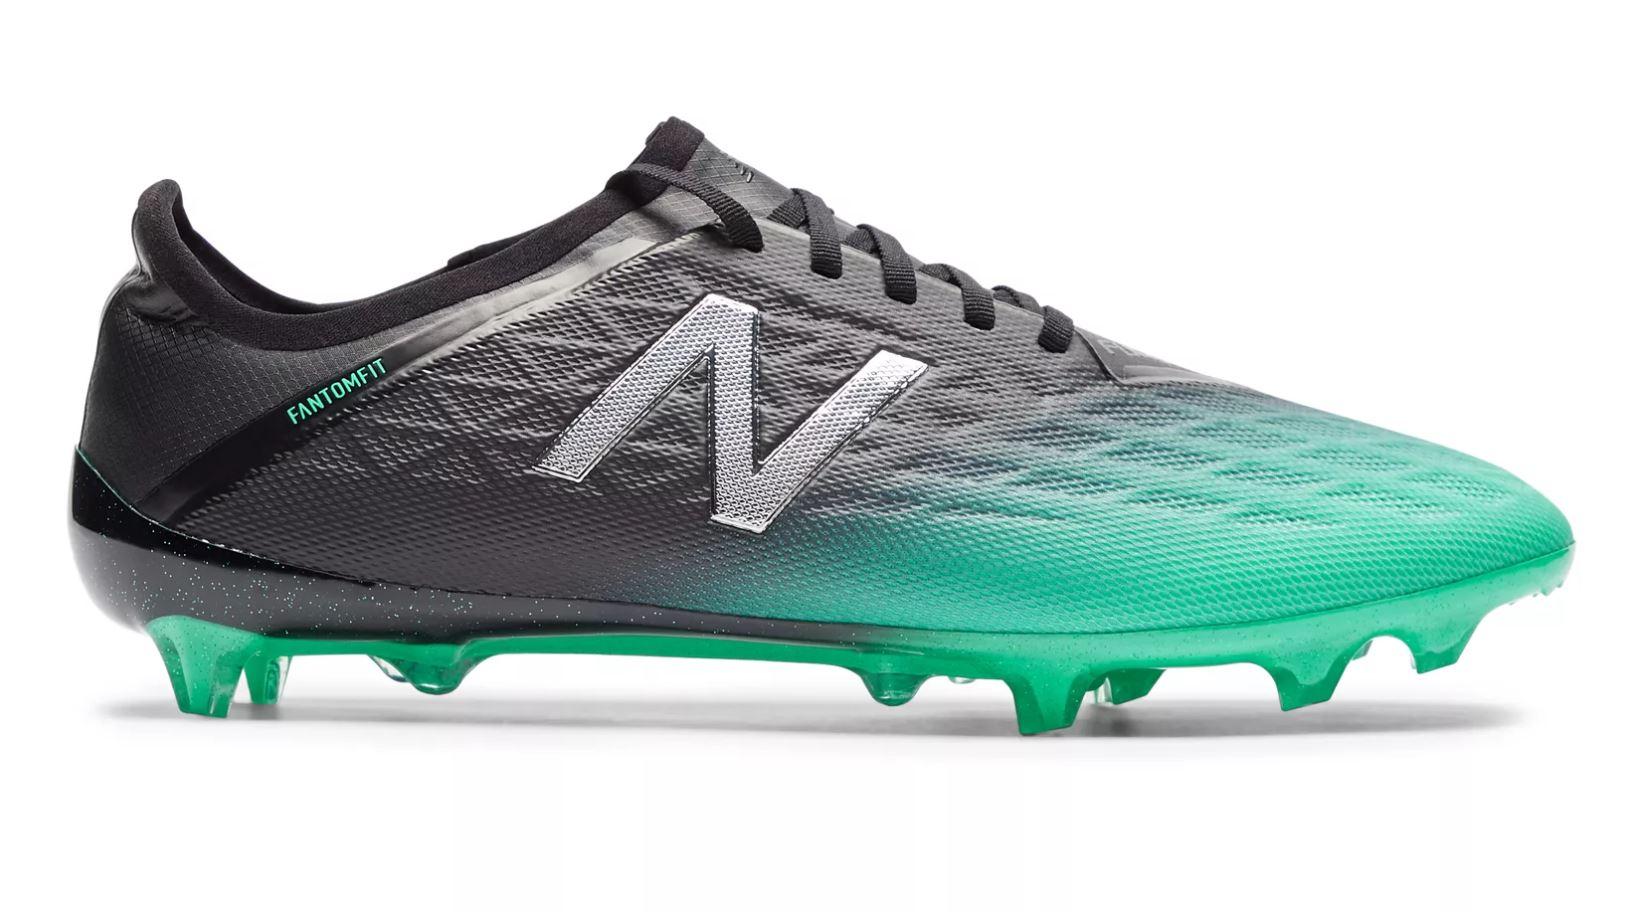 Scarpe Calcio New Balance Furon V5 Pro FG Black Green Pack